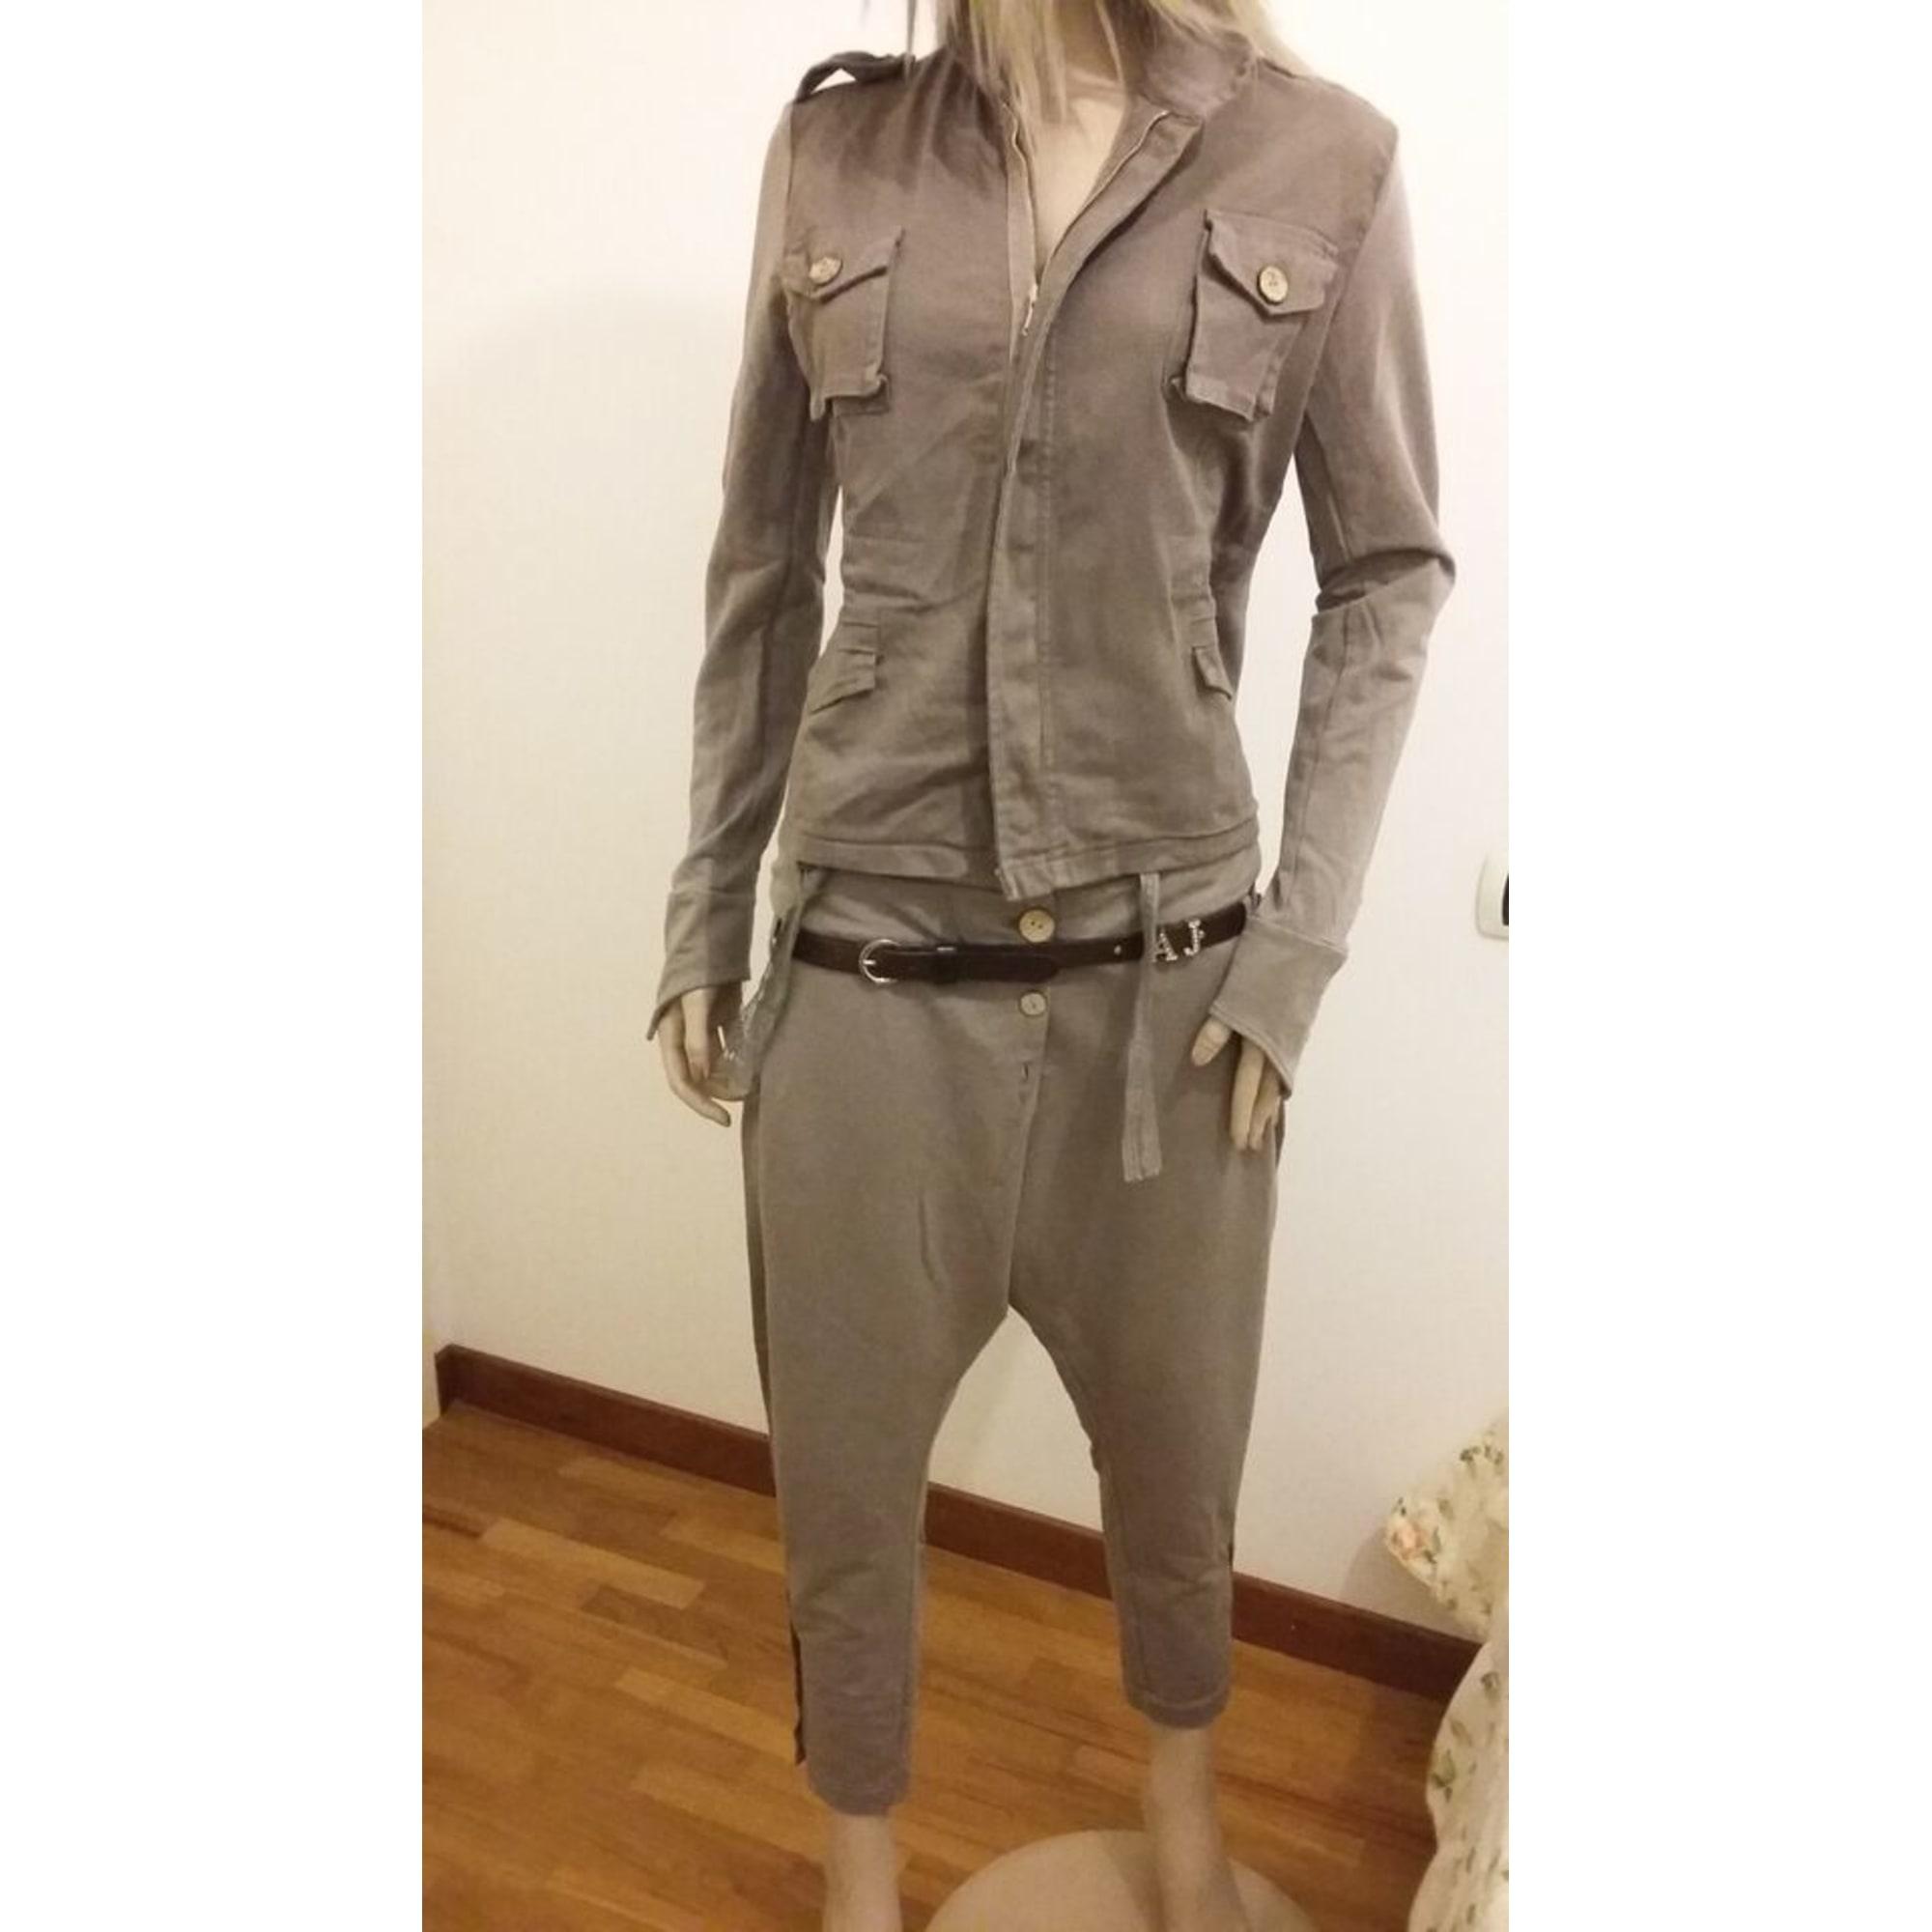 40c5e7abe7 Tailleur pantaloni RISSKIO 40 (L, T3) beige - 4148050